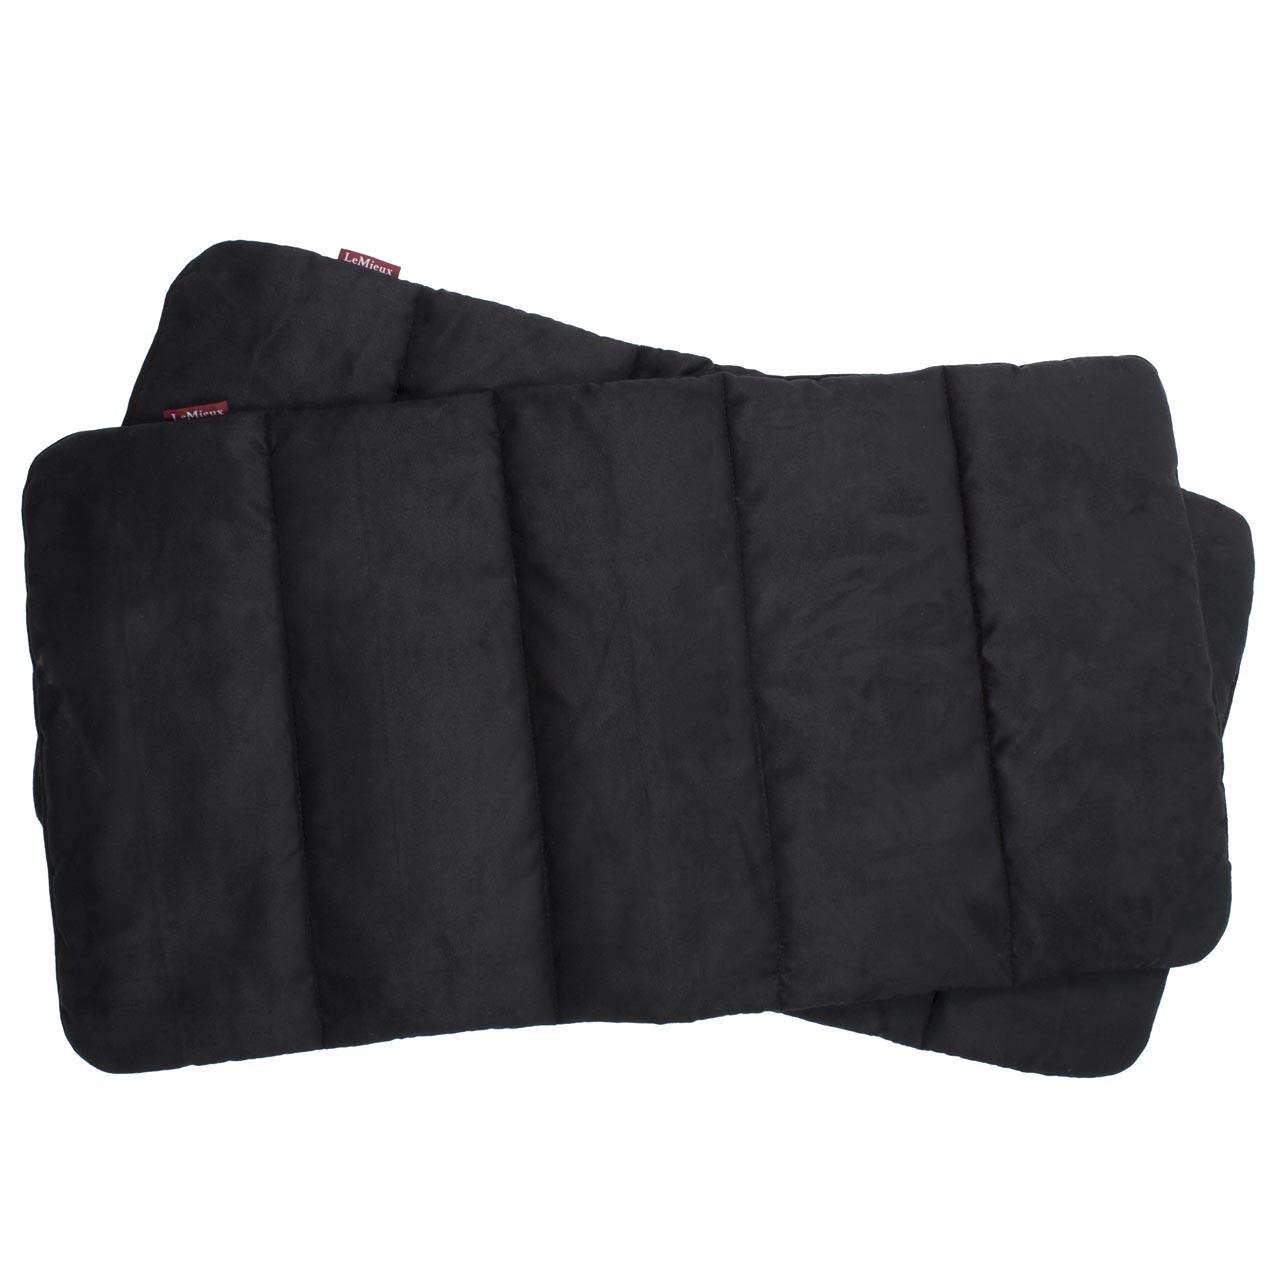 LeMieux Bamboo Pillow onderbandages zwart